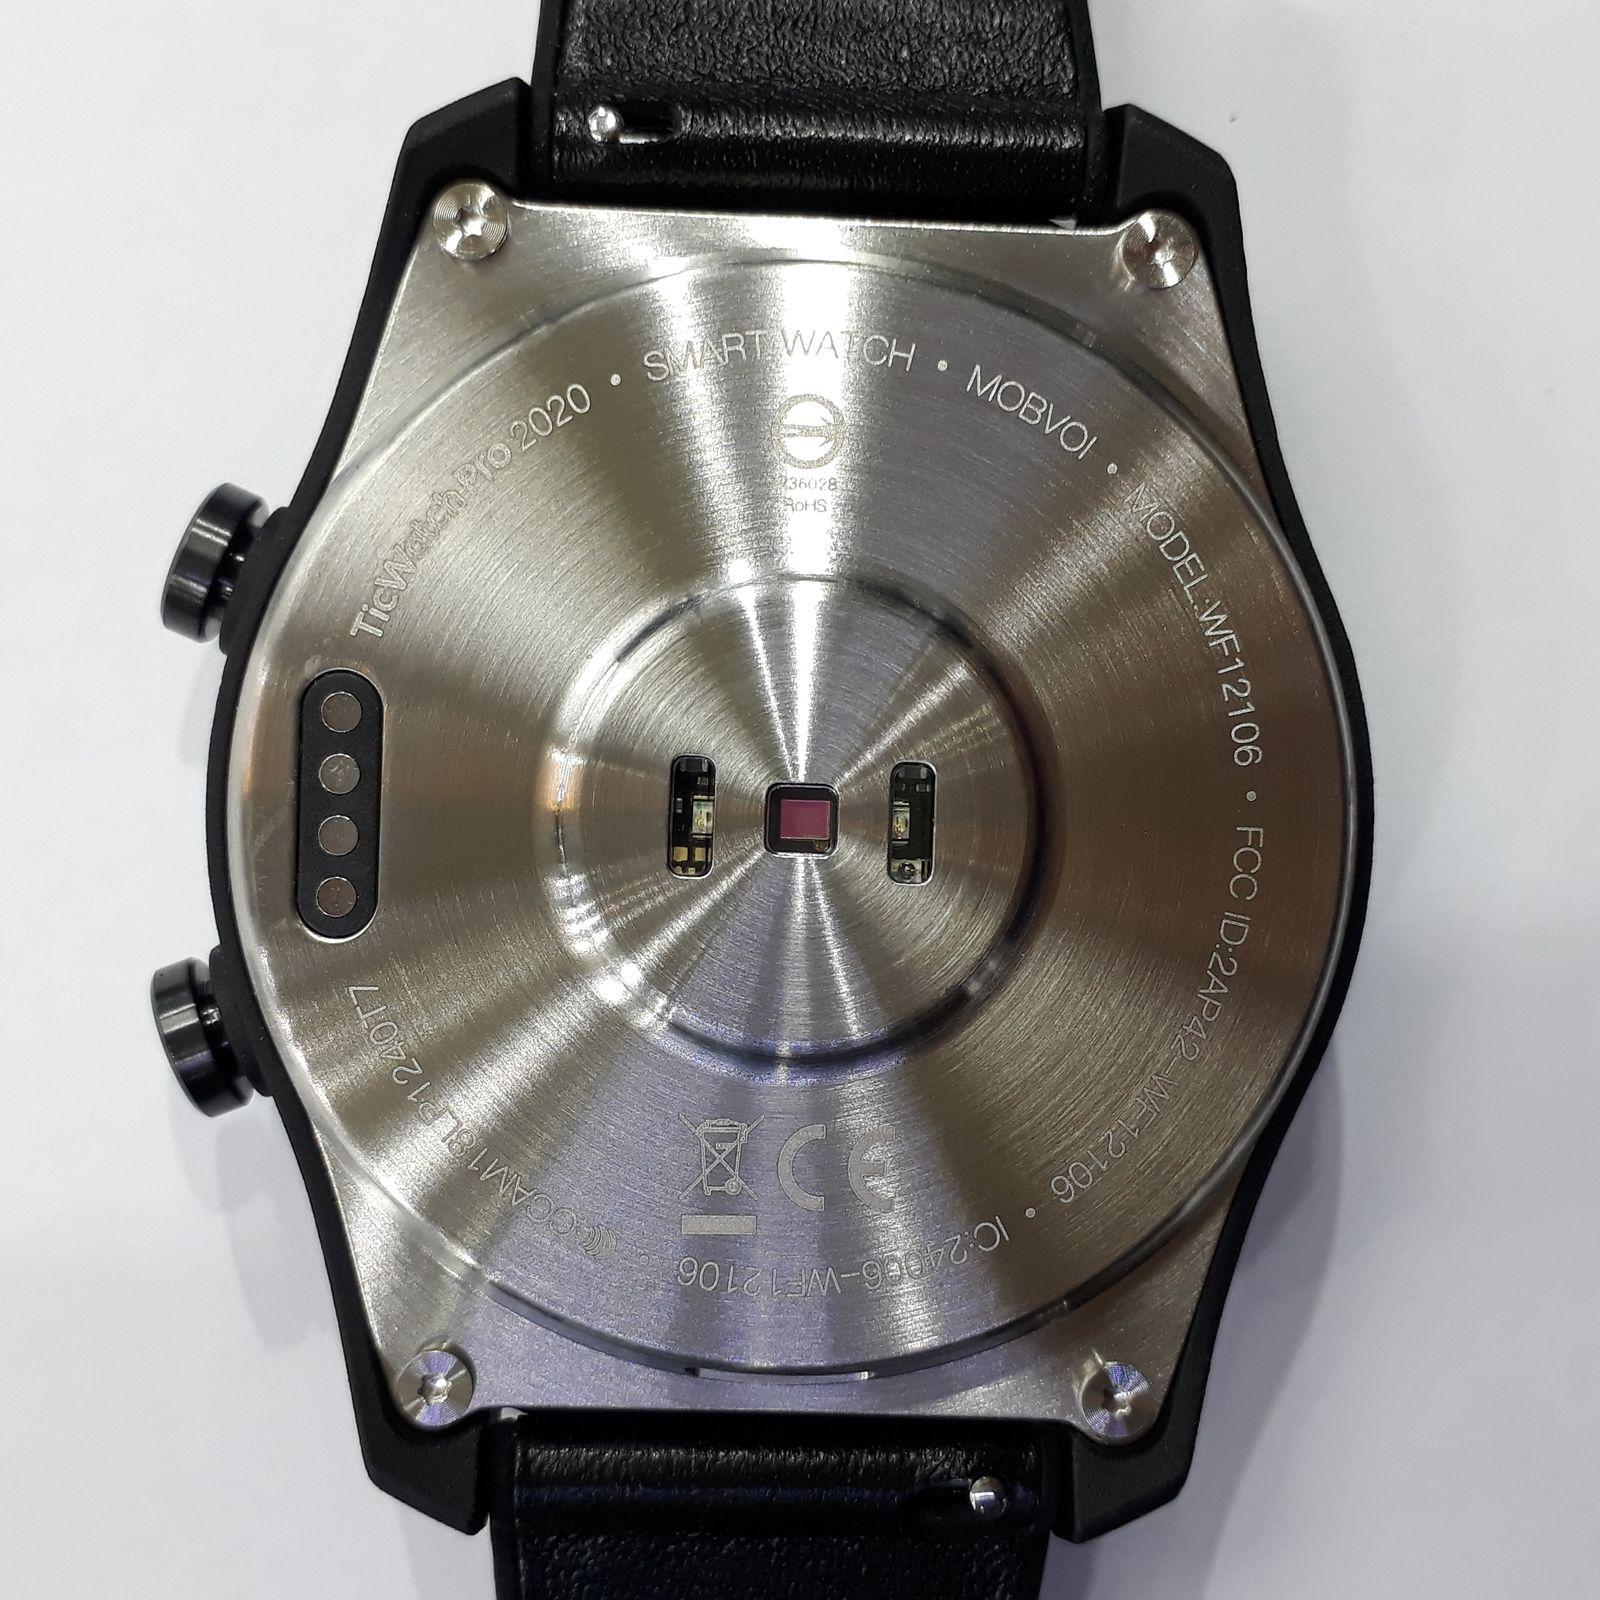 ساعت هوشمند موبووی مدل ticwatch کد PRO 2020 SHADOW BK -  - 5